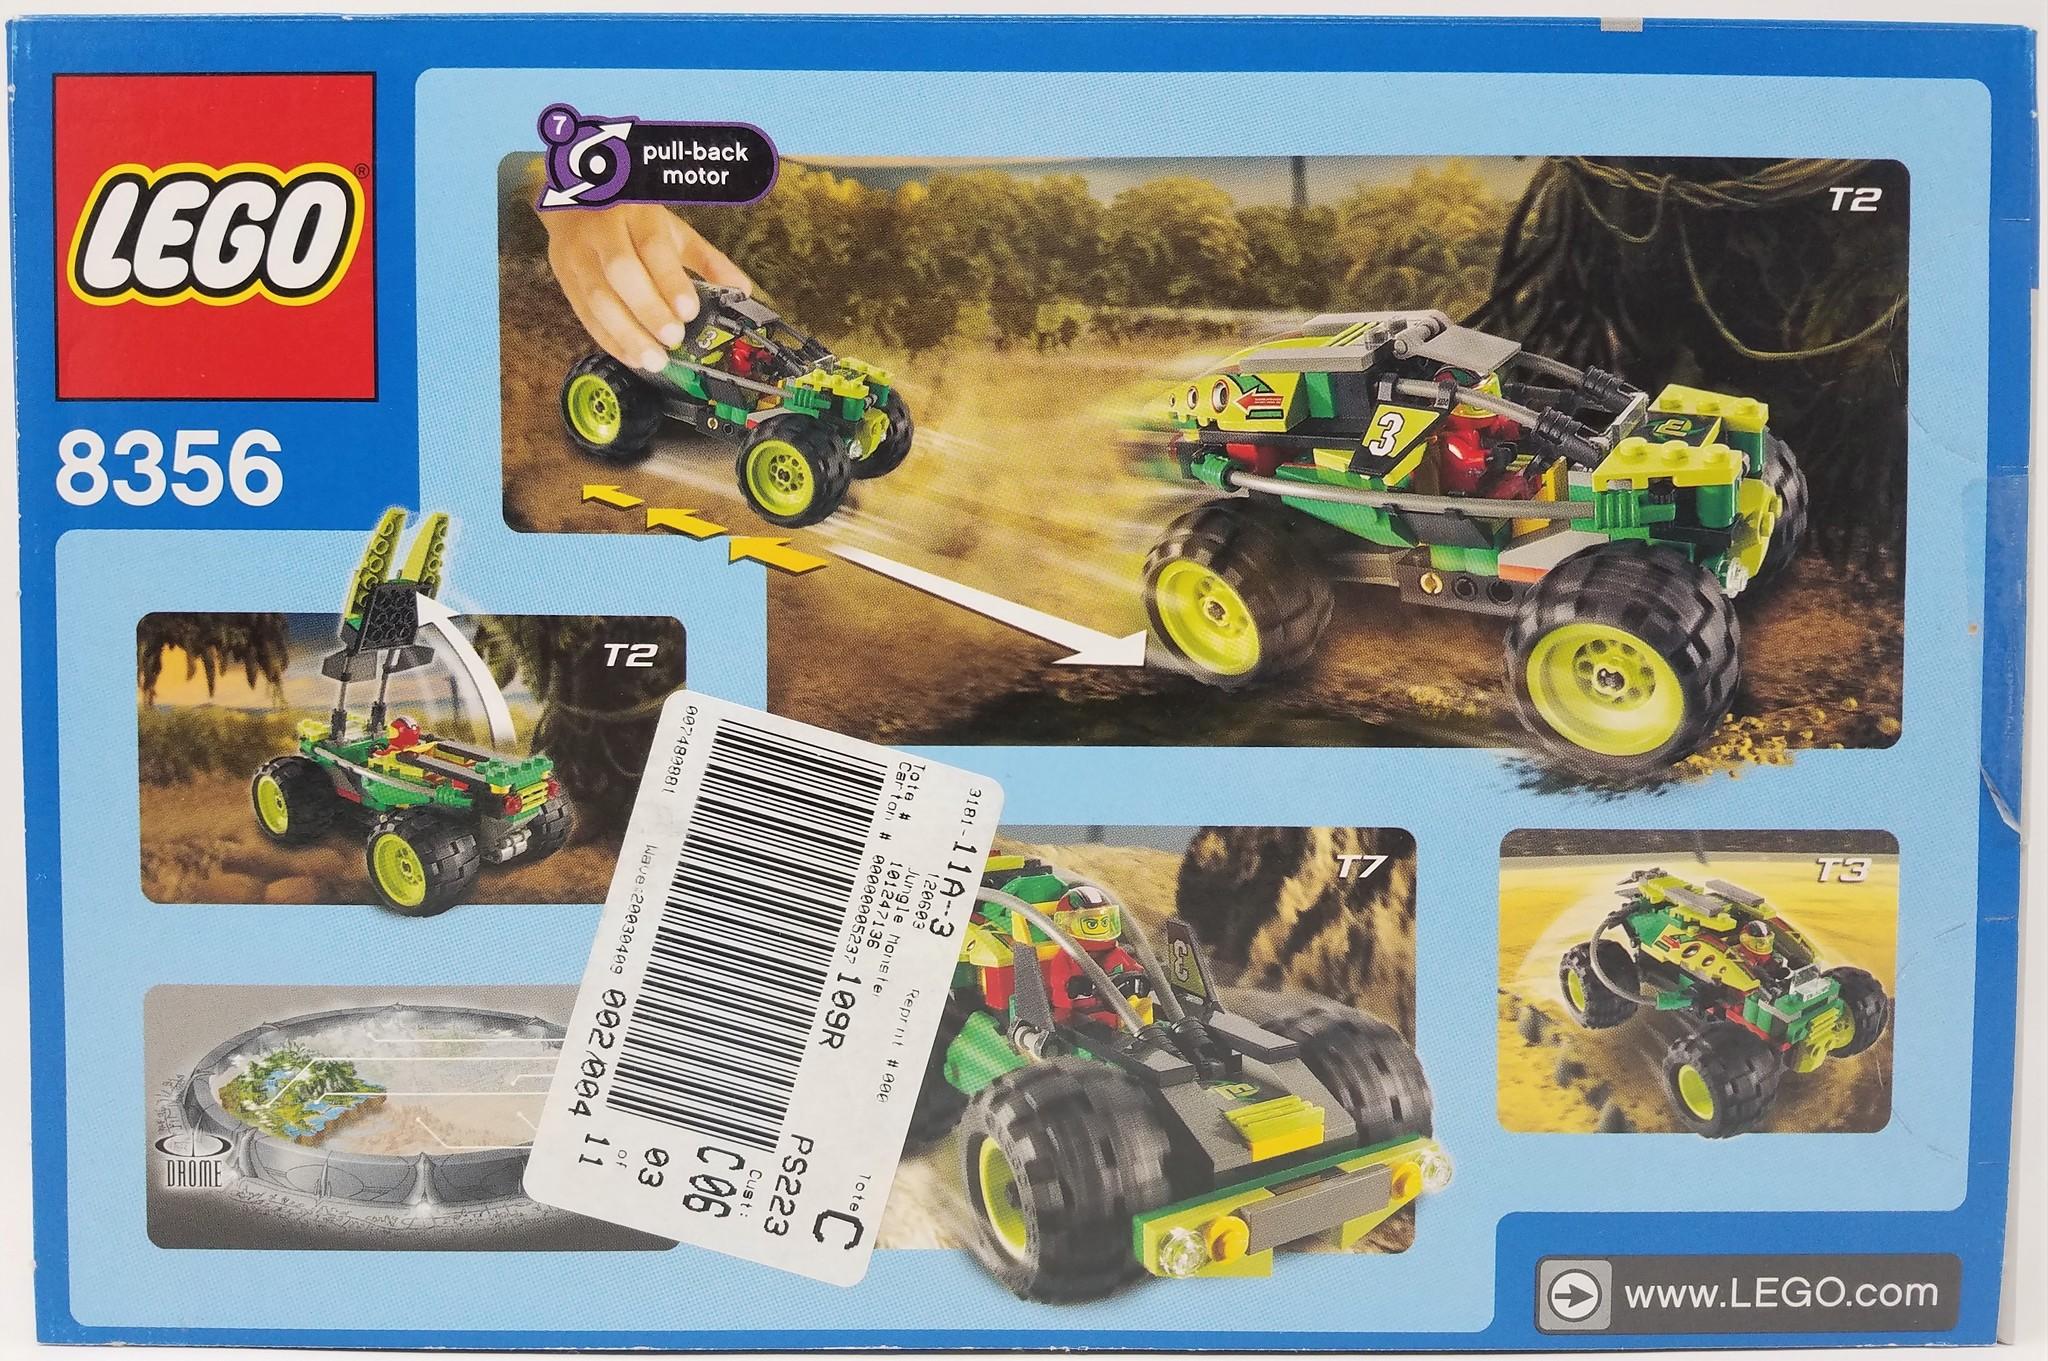 LEGO #8356 Racers: Jungle Monster